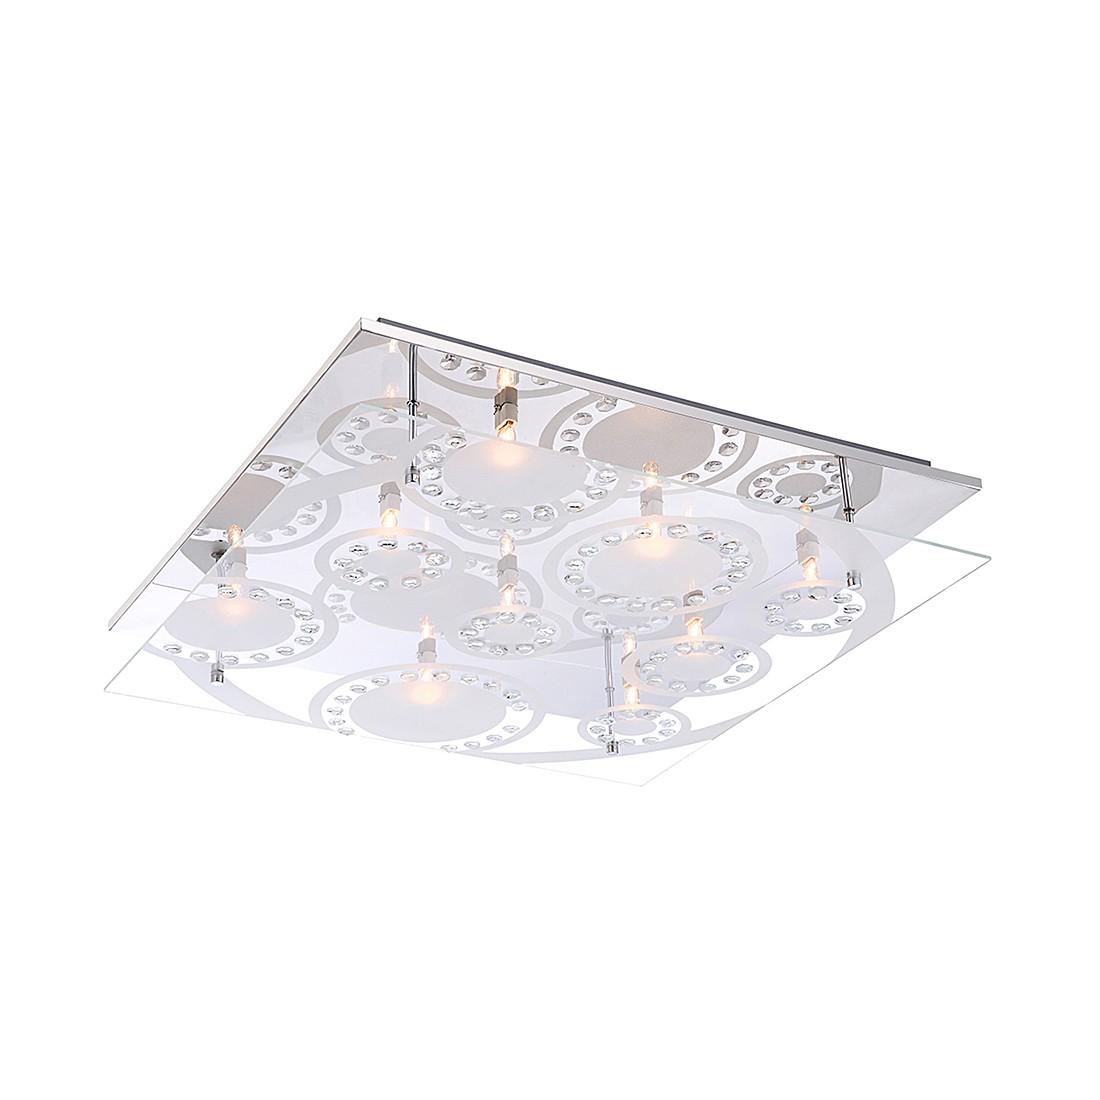 Deckenleuchte Dianne I ● Metall ● Silber ● 9-flammig- Lux A++